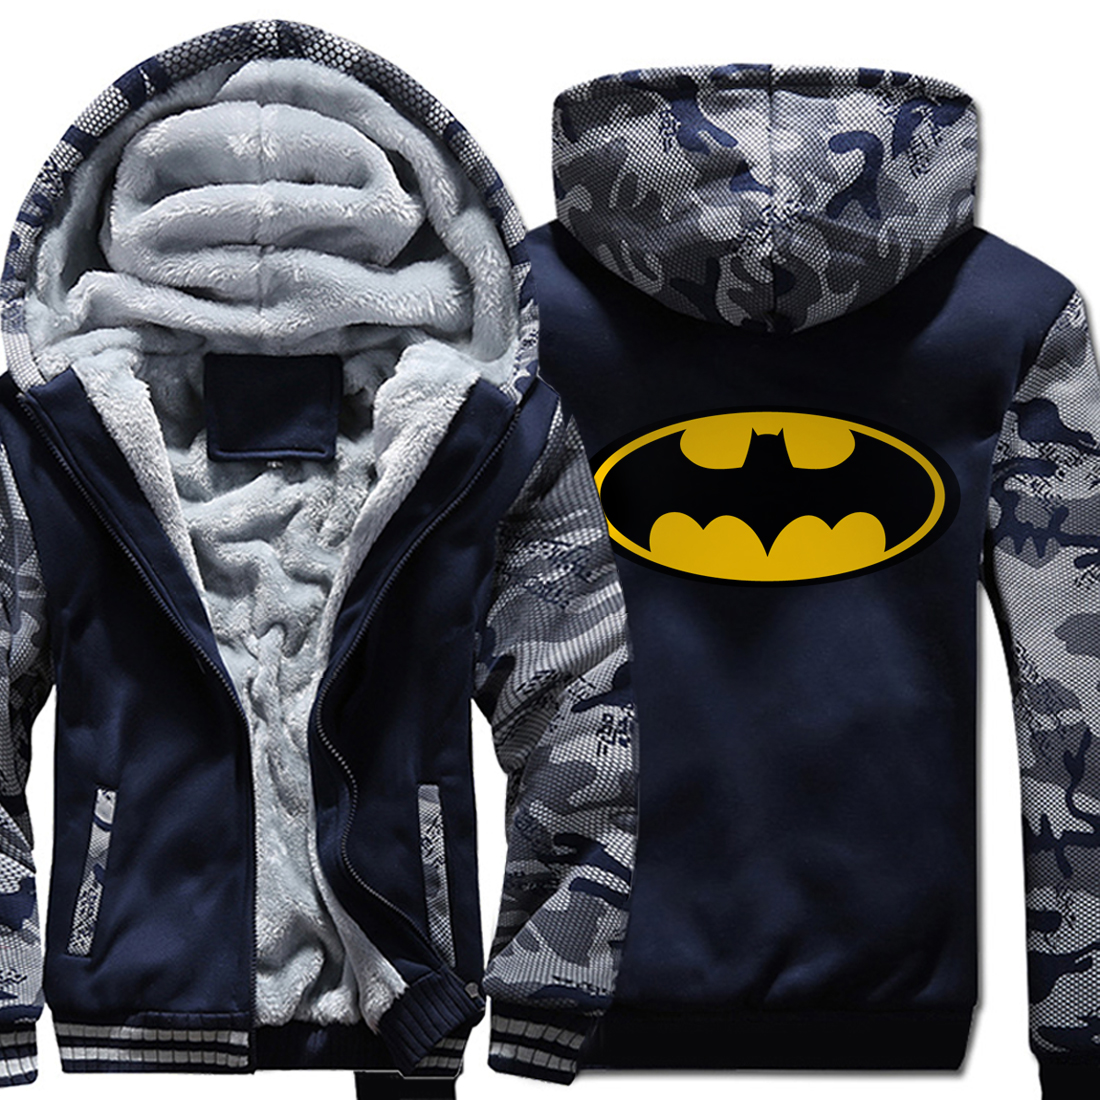 men 39 s hooded wool liner jackets warm Hip Hop brand clothing 2019 winter Cartoon funny sweatshirt fitness Camouflage sleeve coats in Hoodies amp Sweatshirts from Men 39 s Clothing